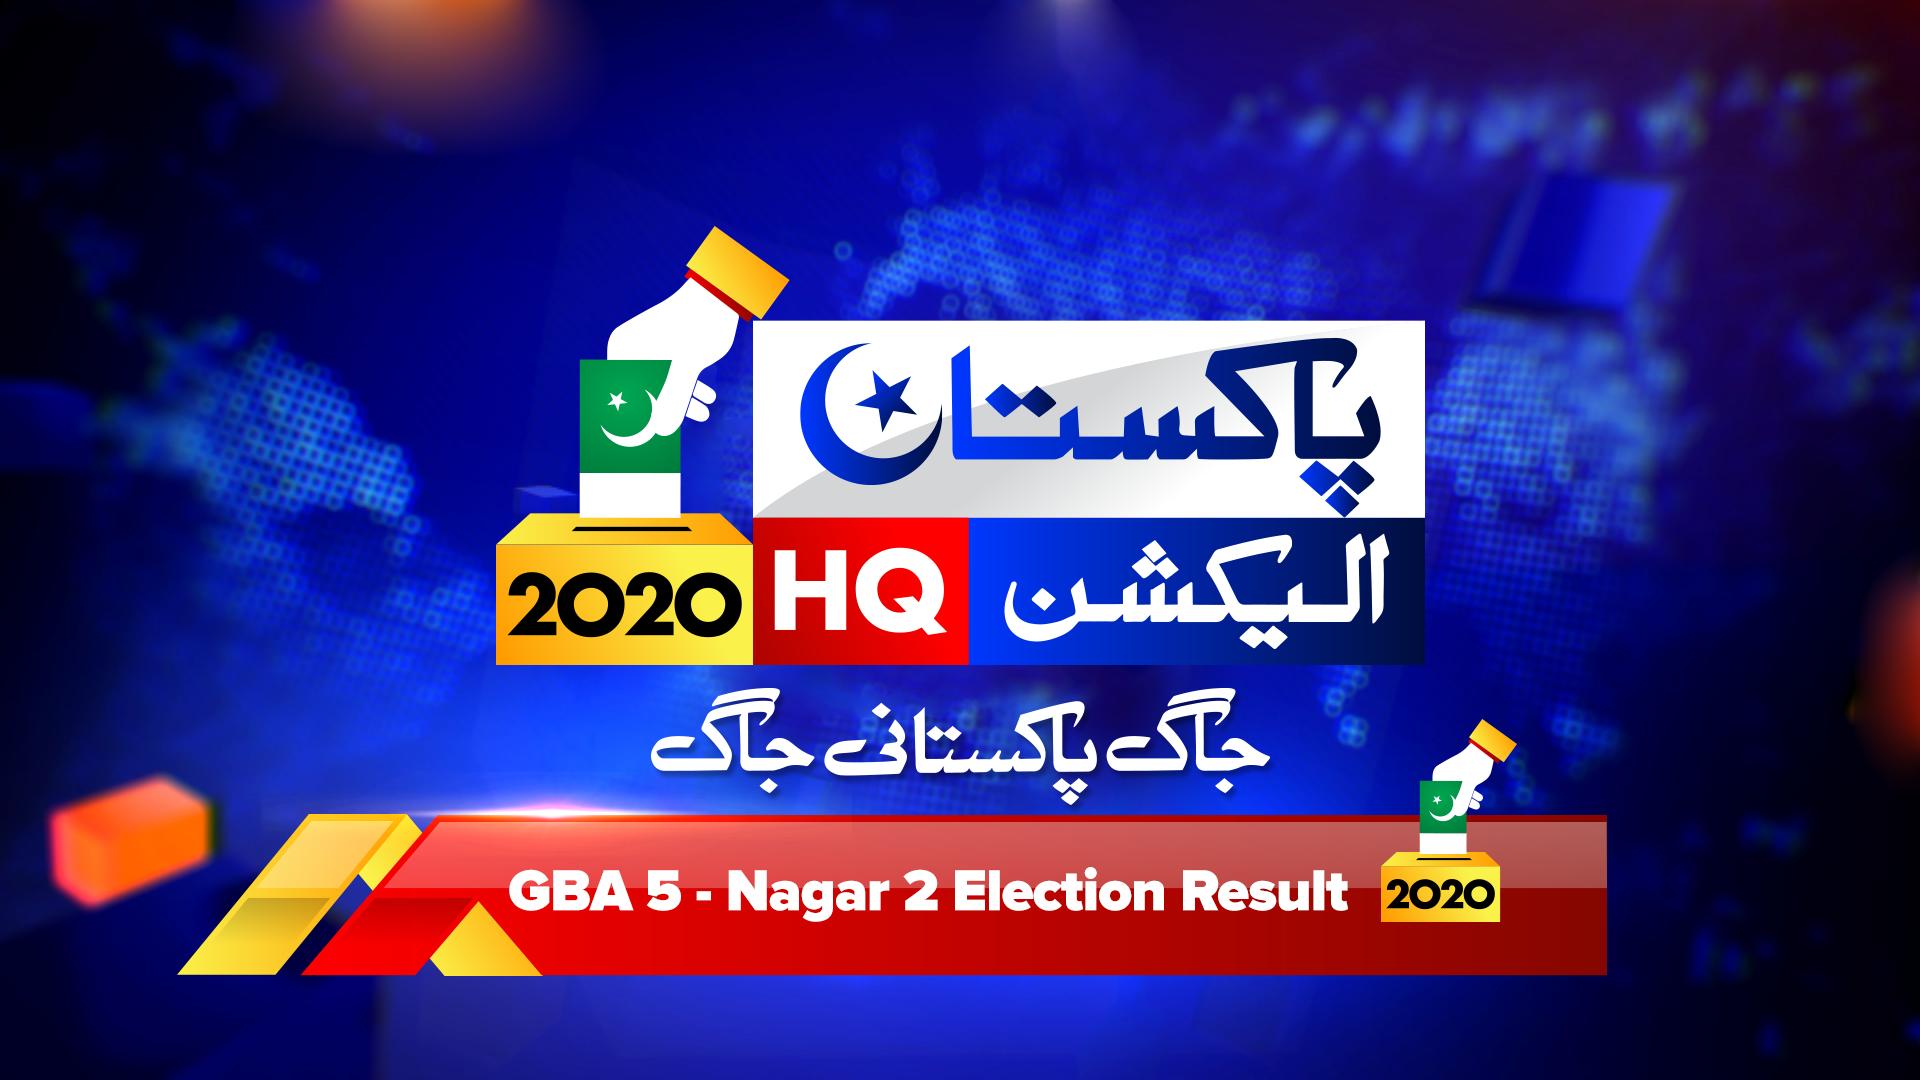 GBA 5 Gilgit 5 Election result